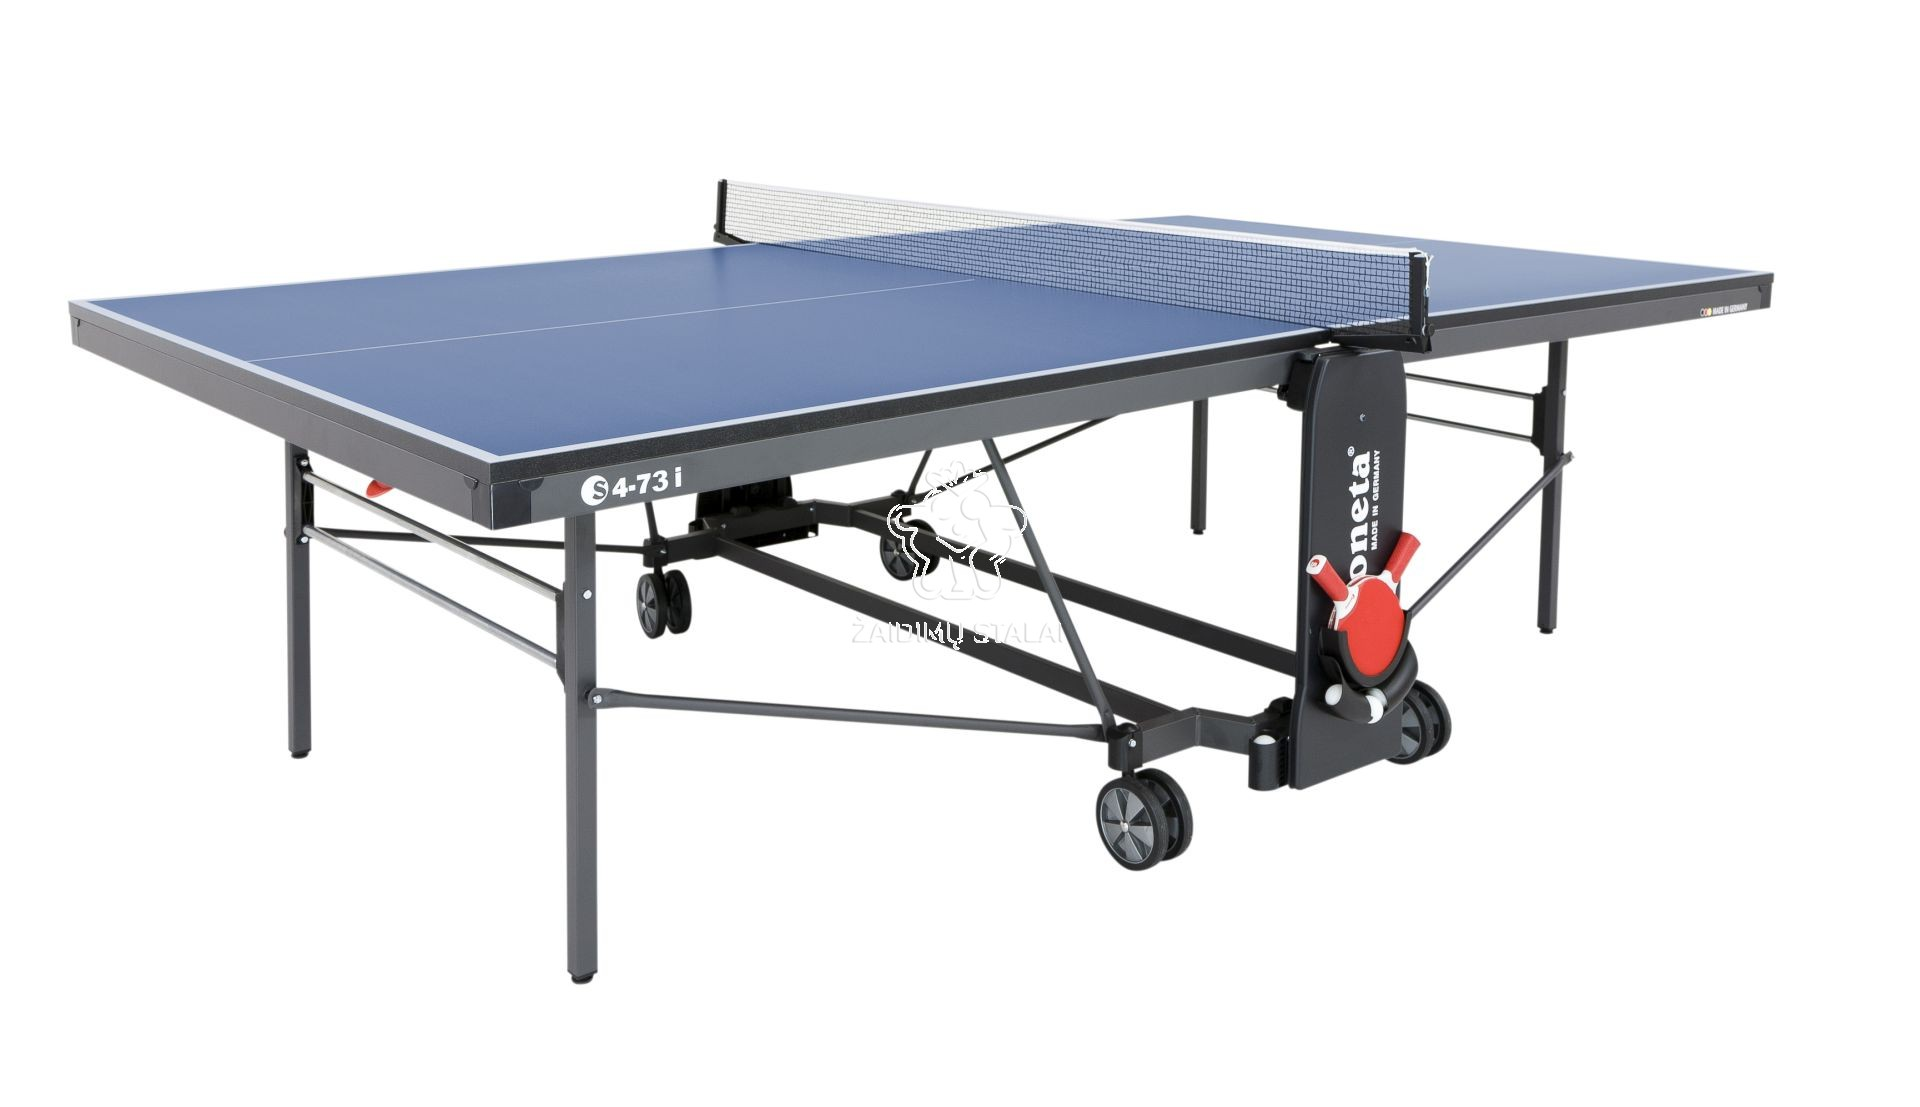 Stalo teniso stalas Sponeta S4-73i, mėlynas, 19mm MDF vidaus